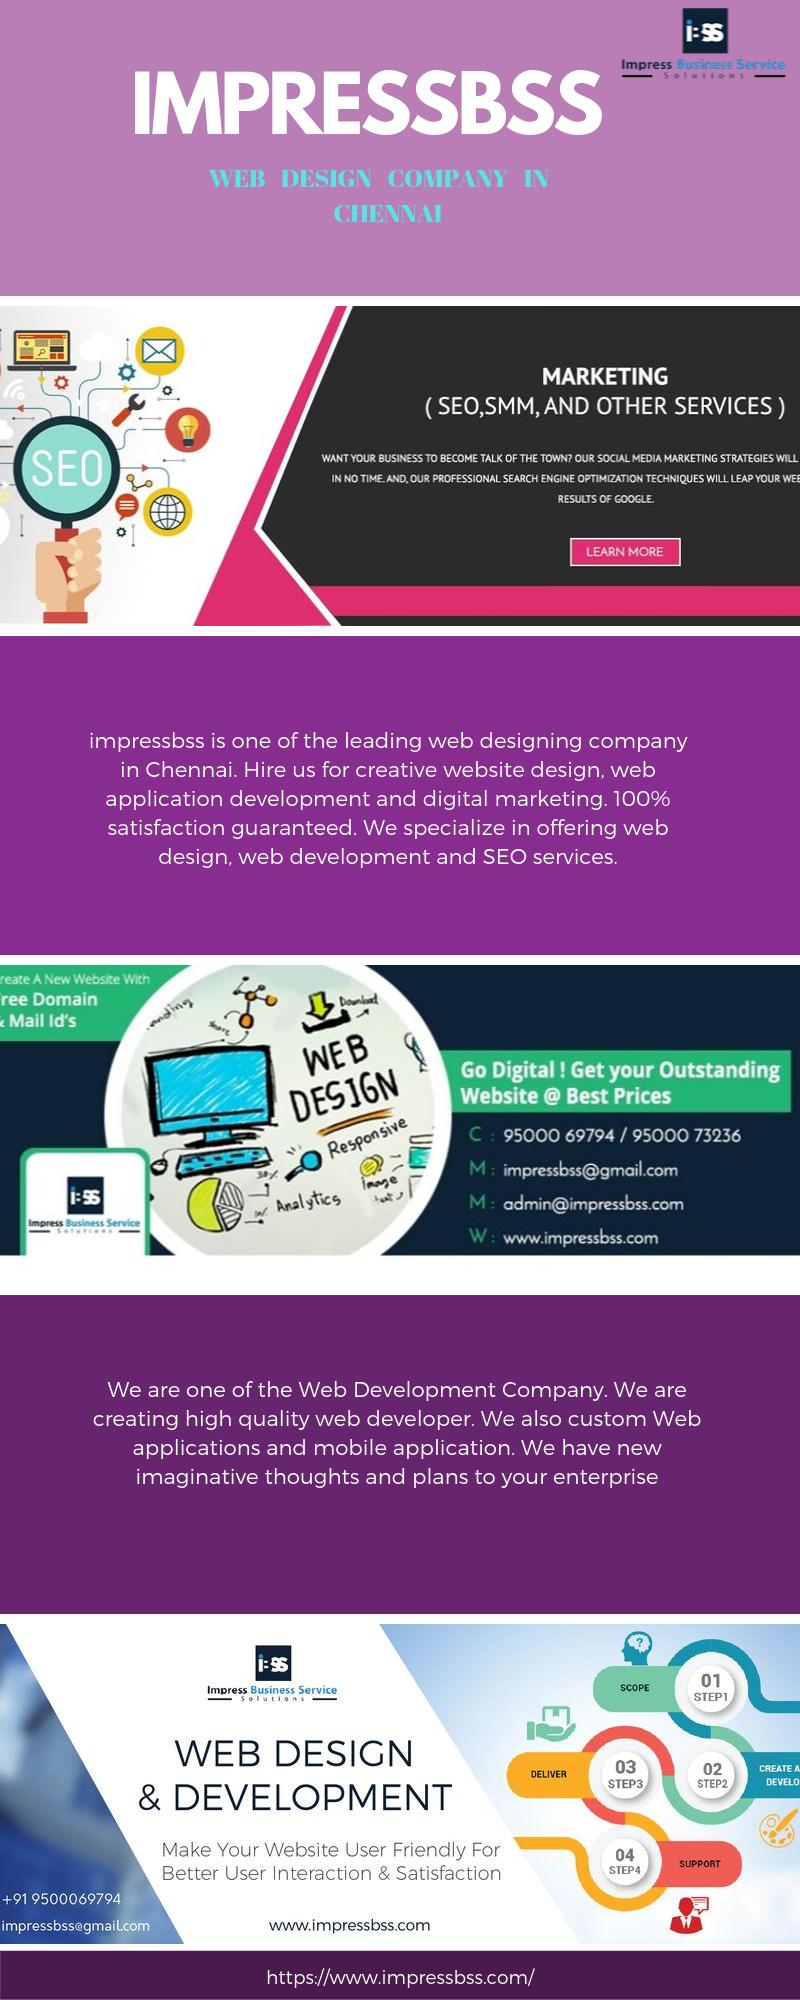 Pin By Impressbss Designer On Web Designing With Images Web Design Company Web Design Fun Website Design